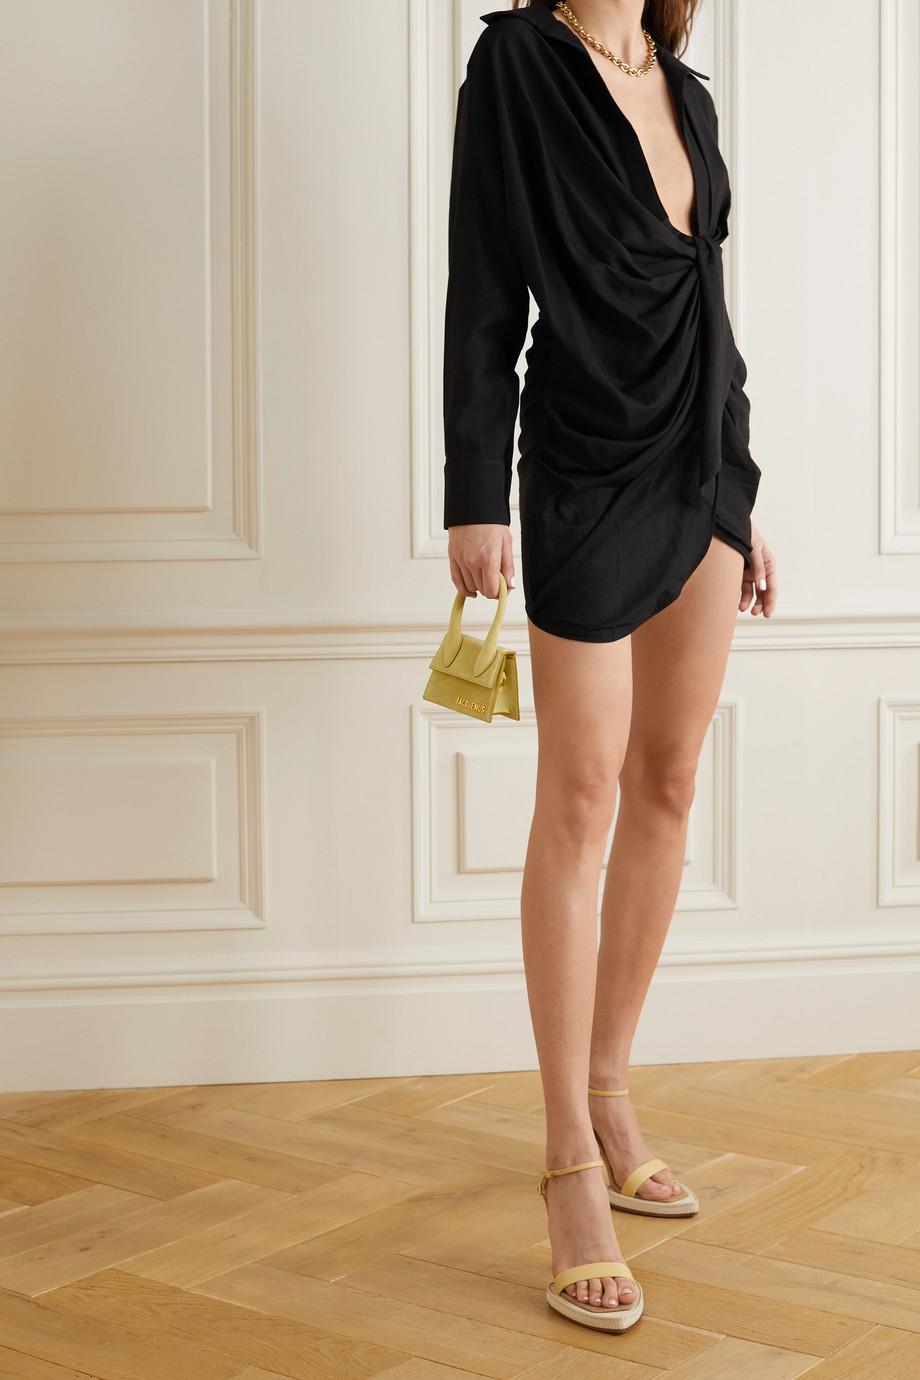 Jacquemus Bahia knotted twill mini dress